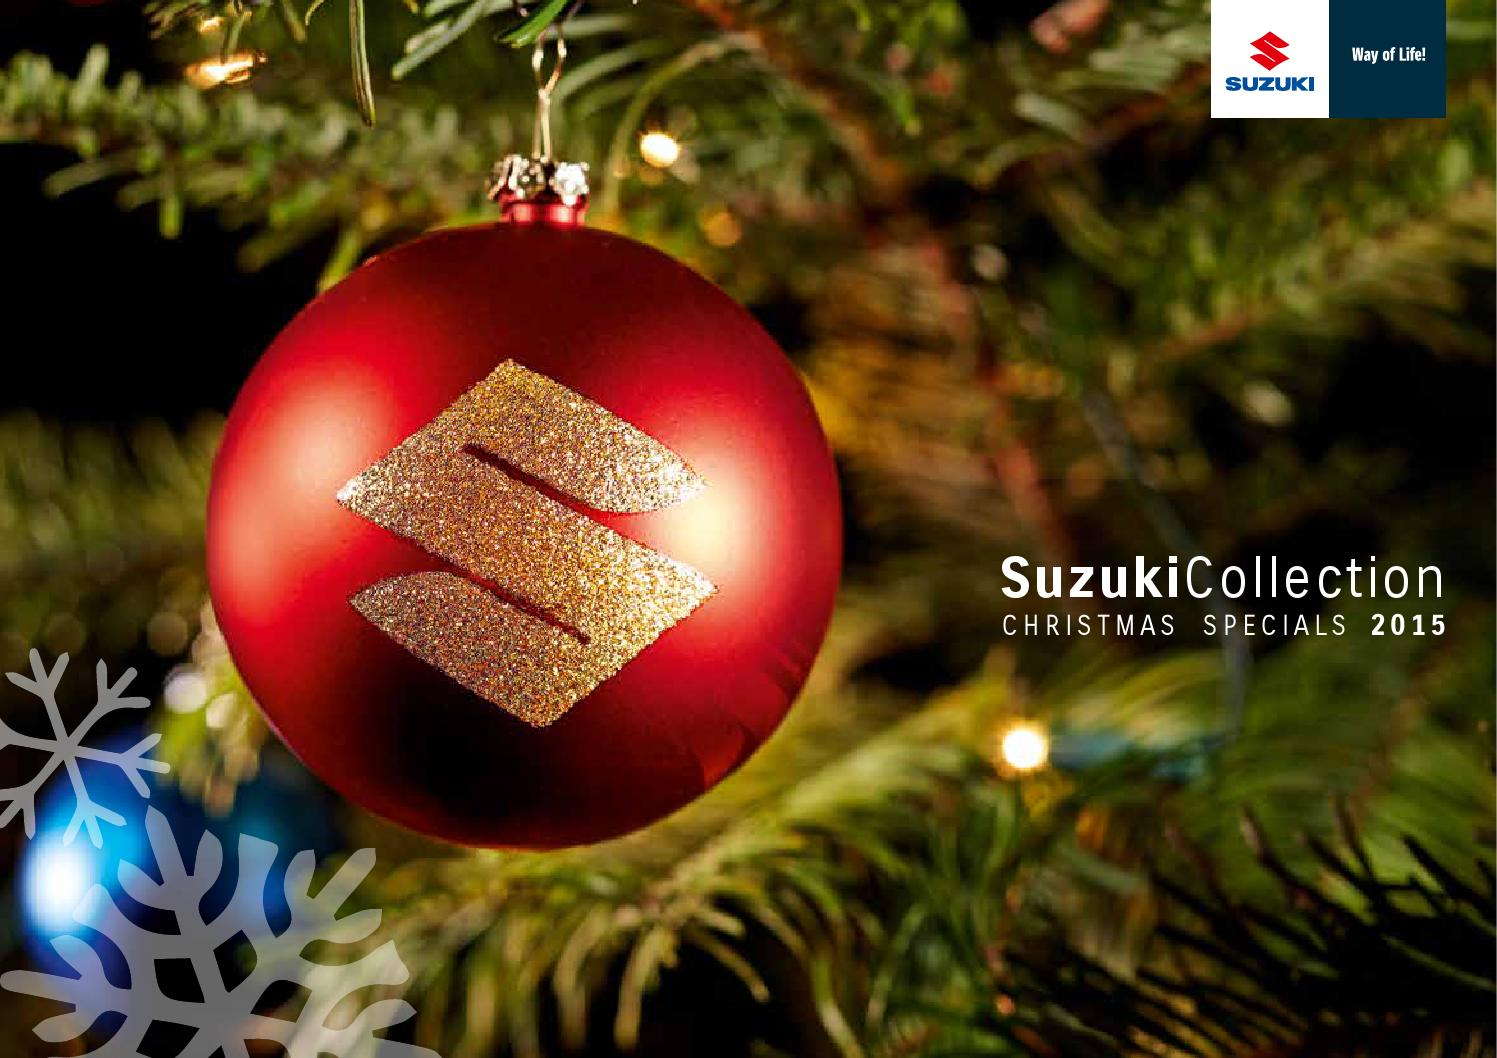 suzuki 2015 christmas collection by c reinhardt as issuu - 2015 Christmas Specials